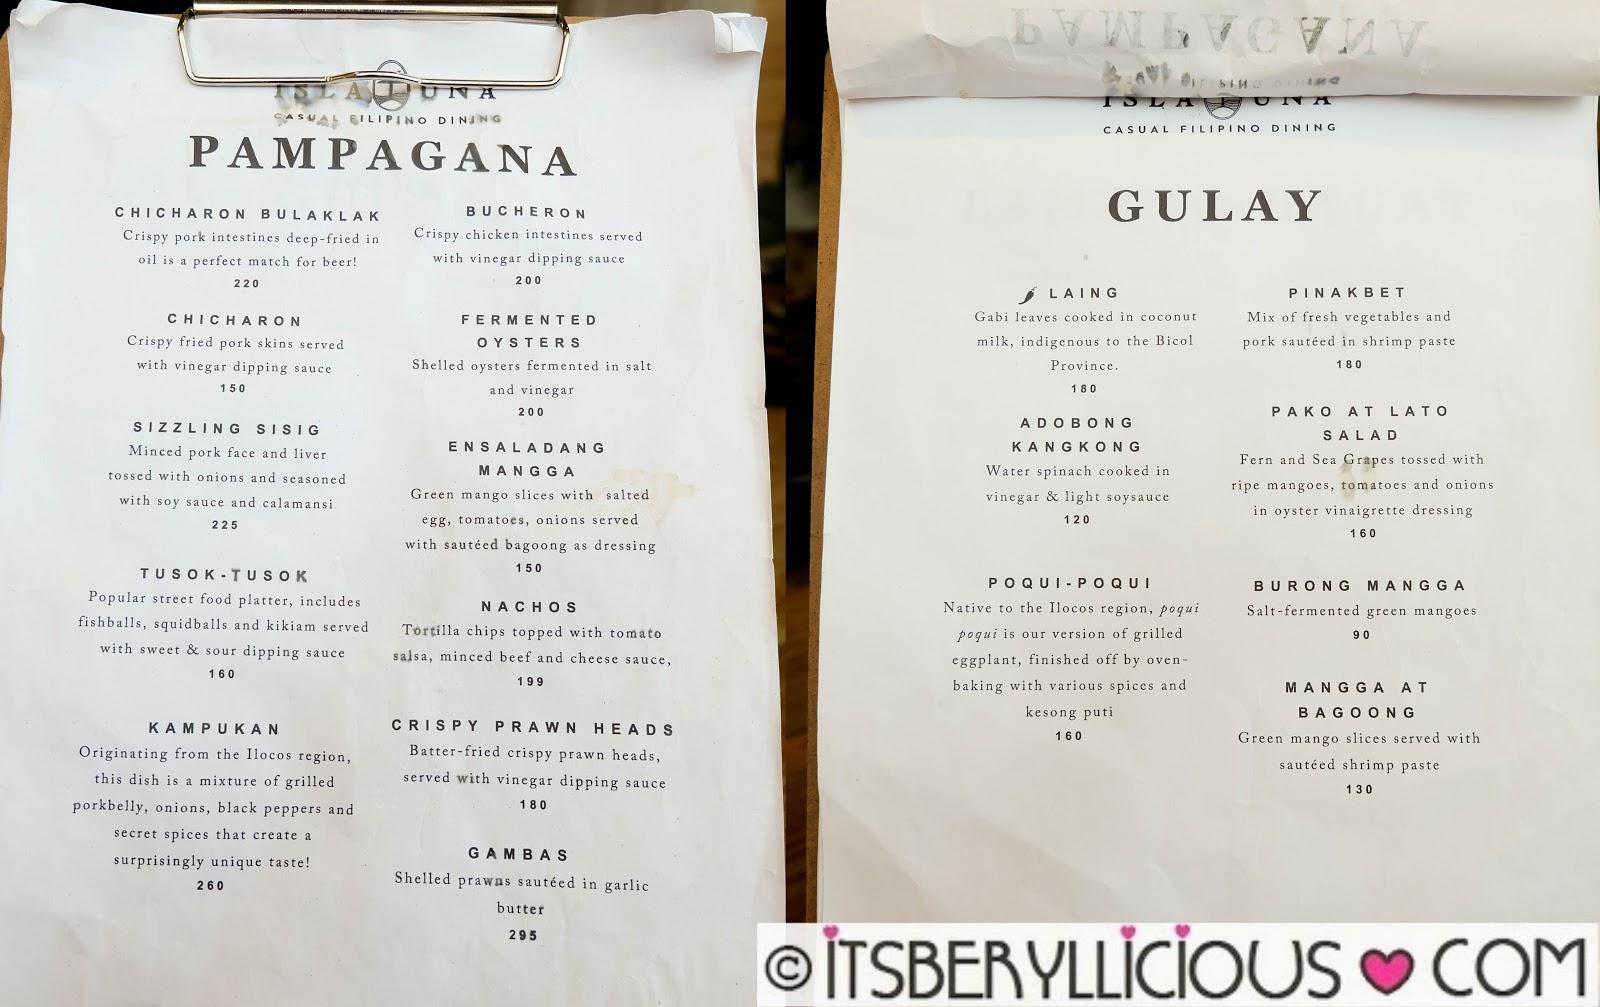 Isla Una Casual Filipino Dining- P199 Lunch Specials at ...